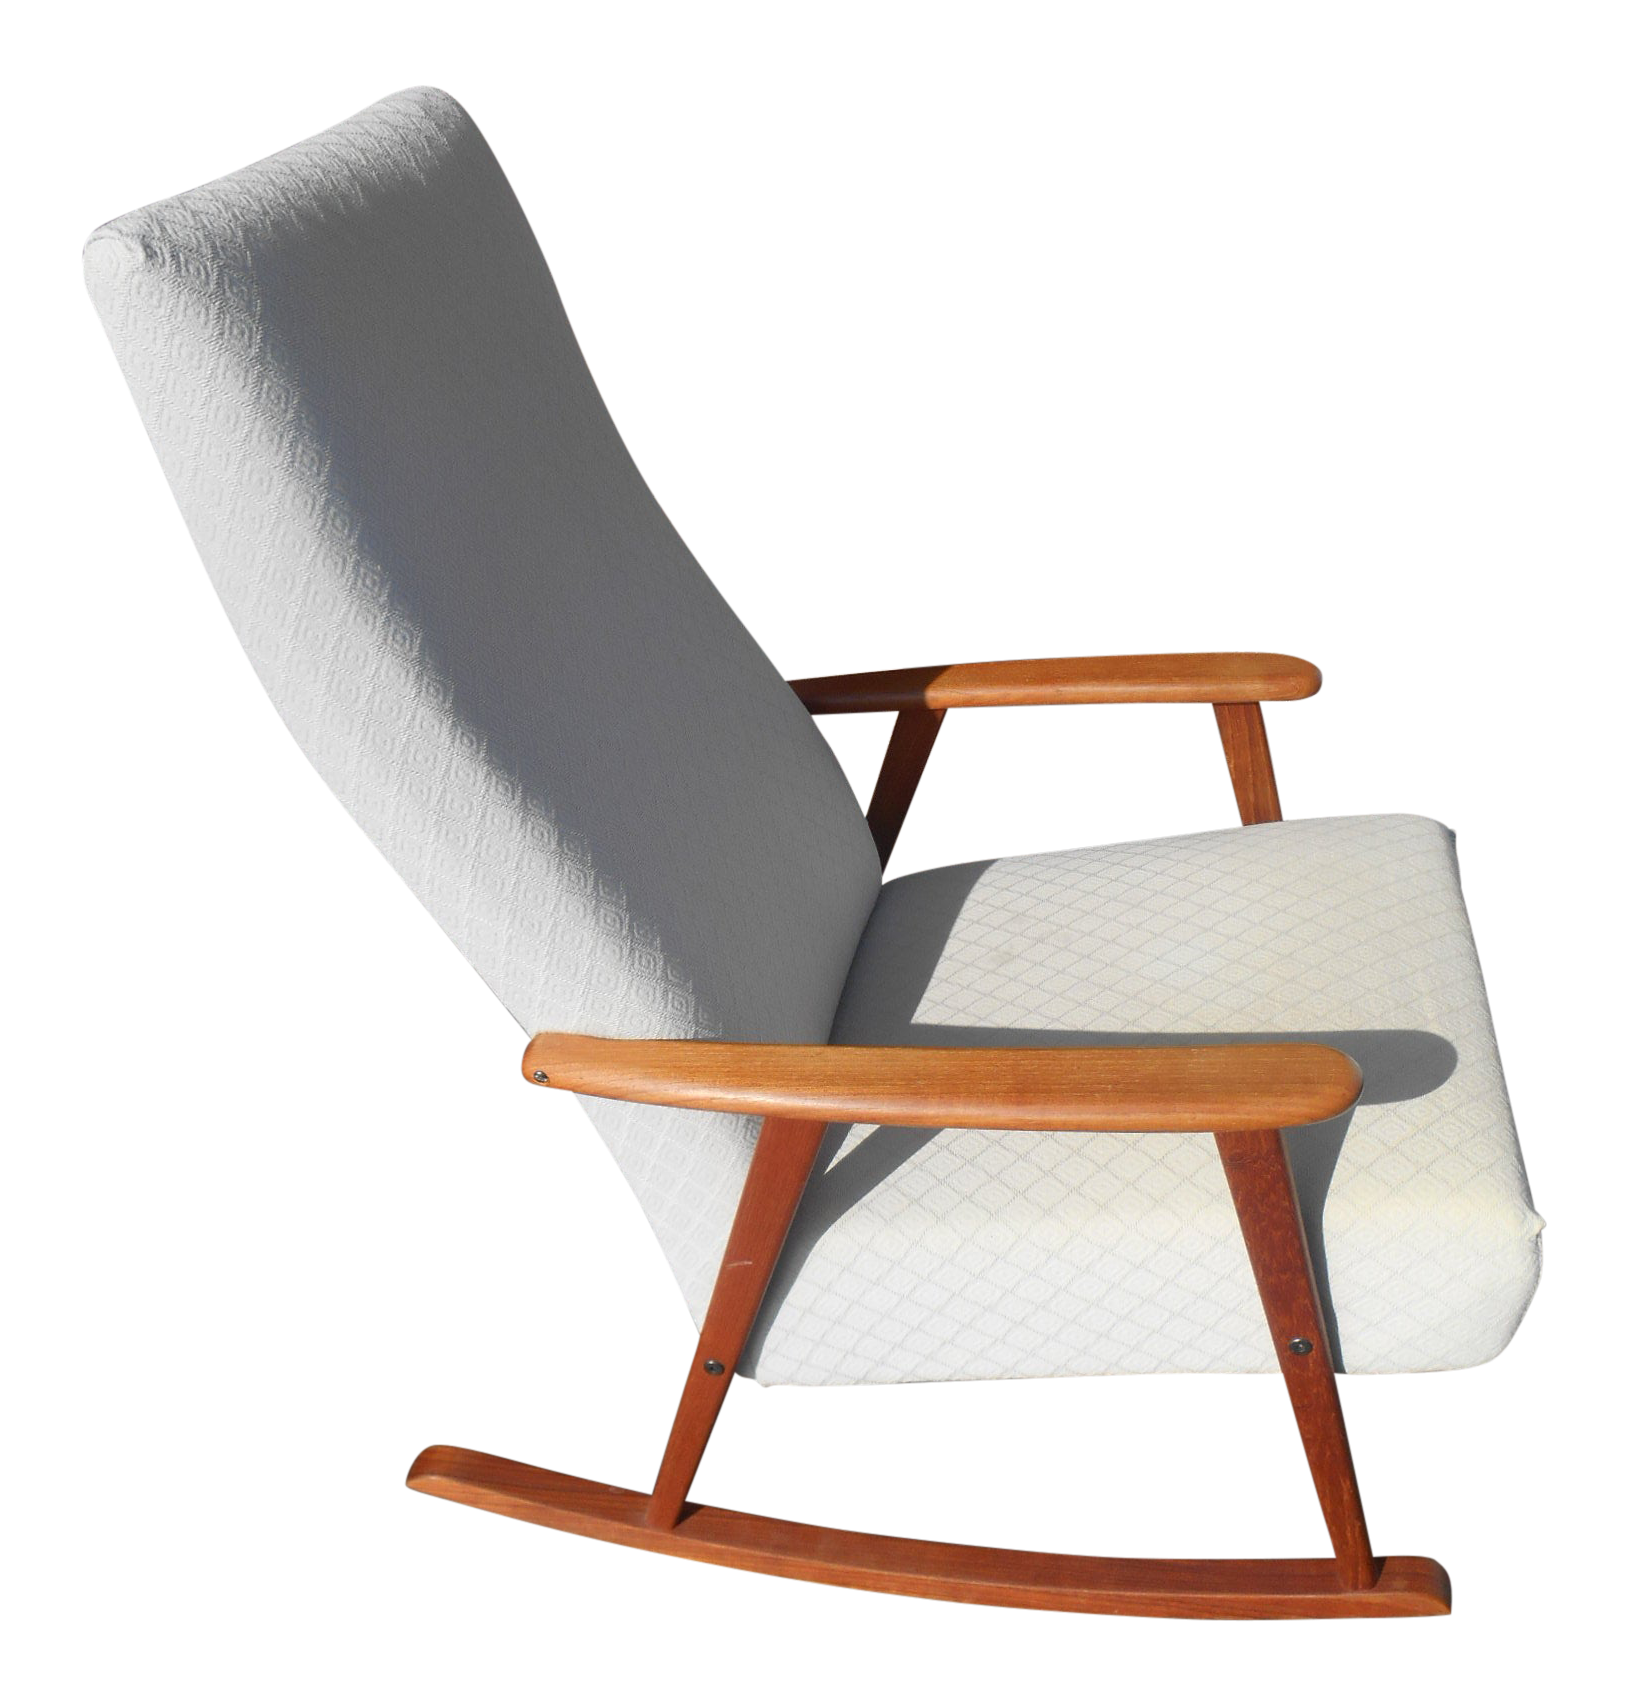 Vintage 1960s Mid Century Modern Danish Teak Rocking Chair Chairish